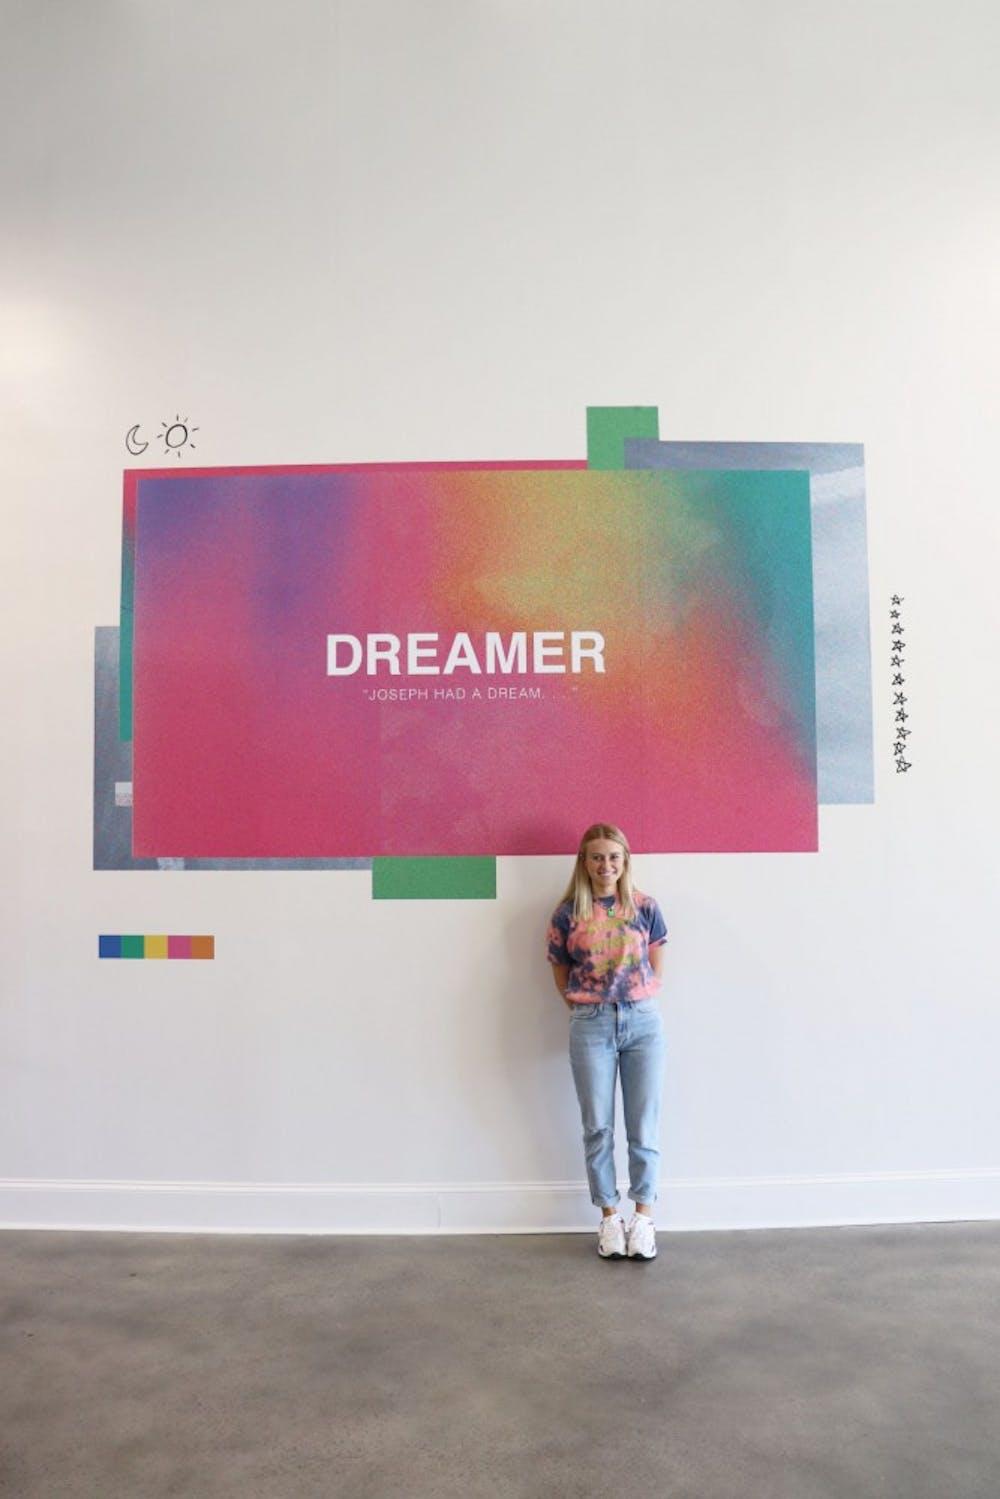 Auburn graphic design student creates art for local church